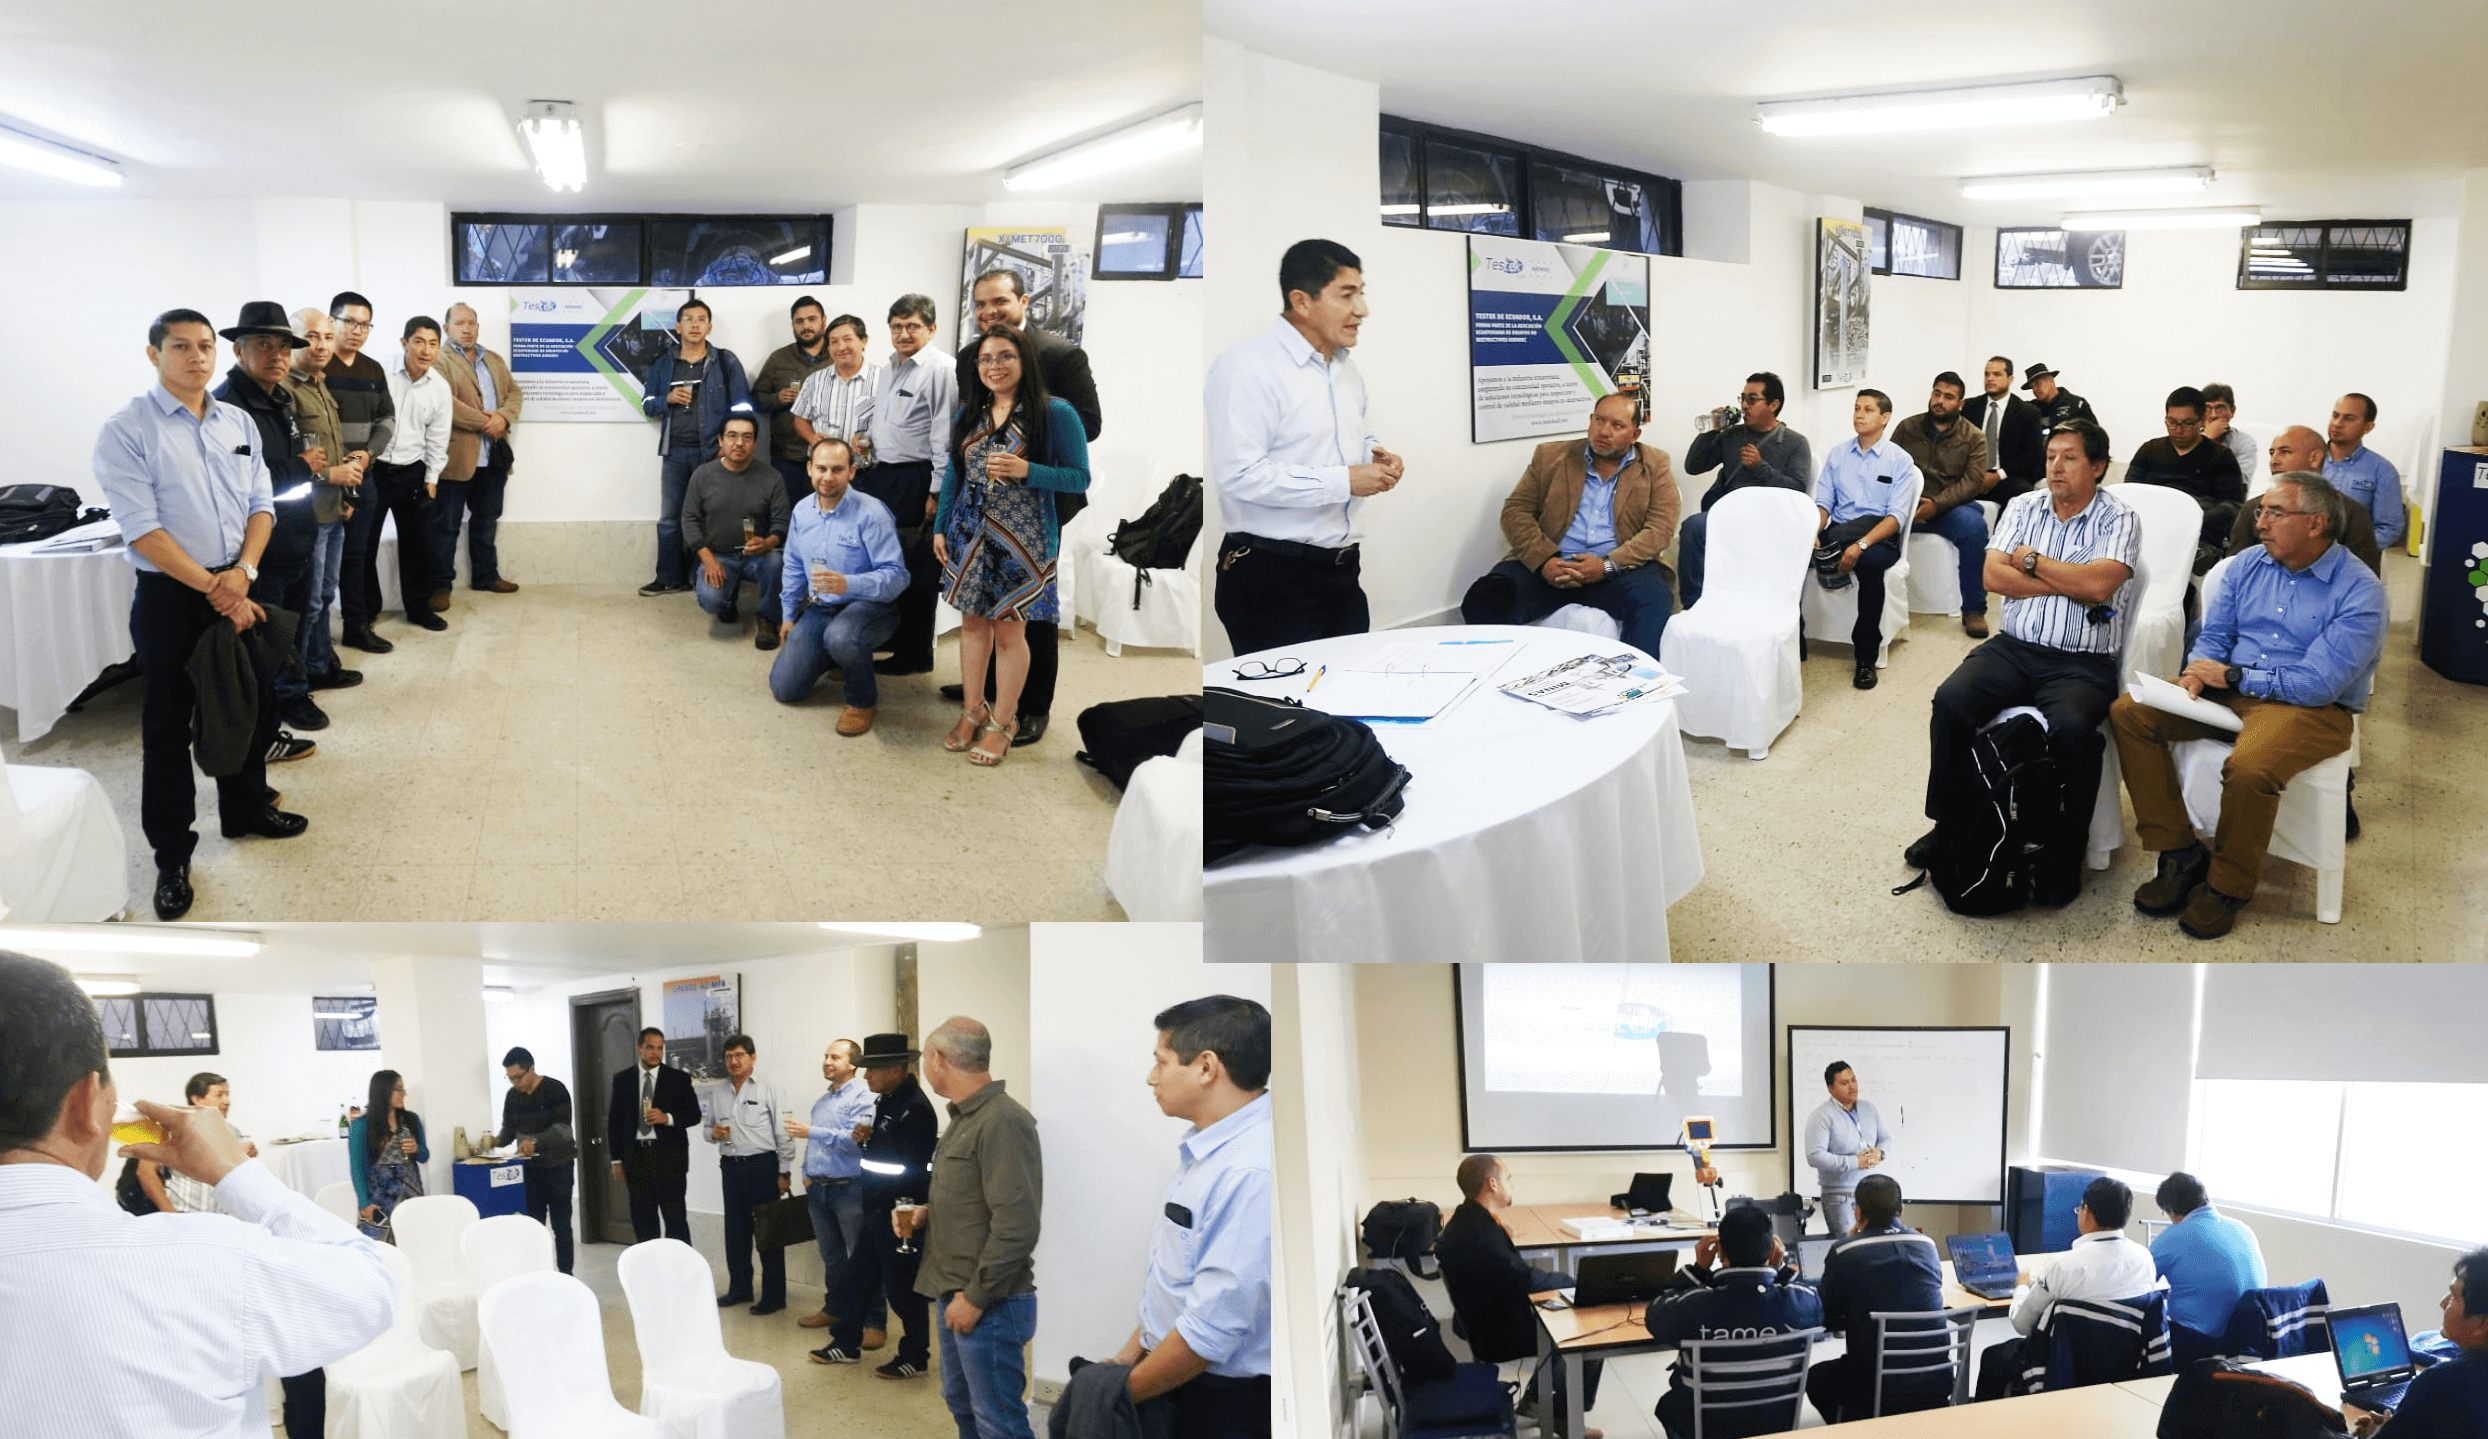 Grupo-Testek-Ecuador-apoya-ASENDEC-NDT-noticia-min2